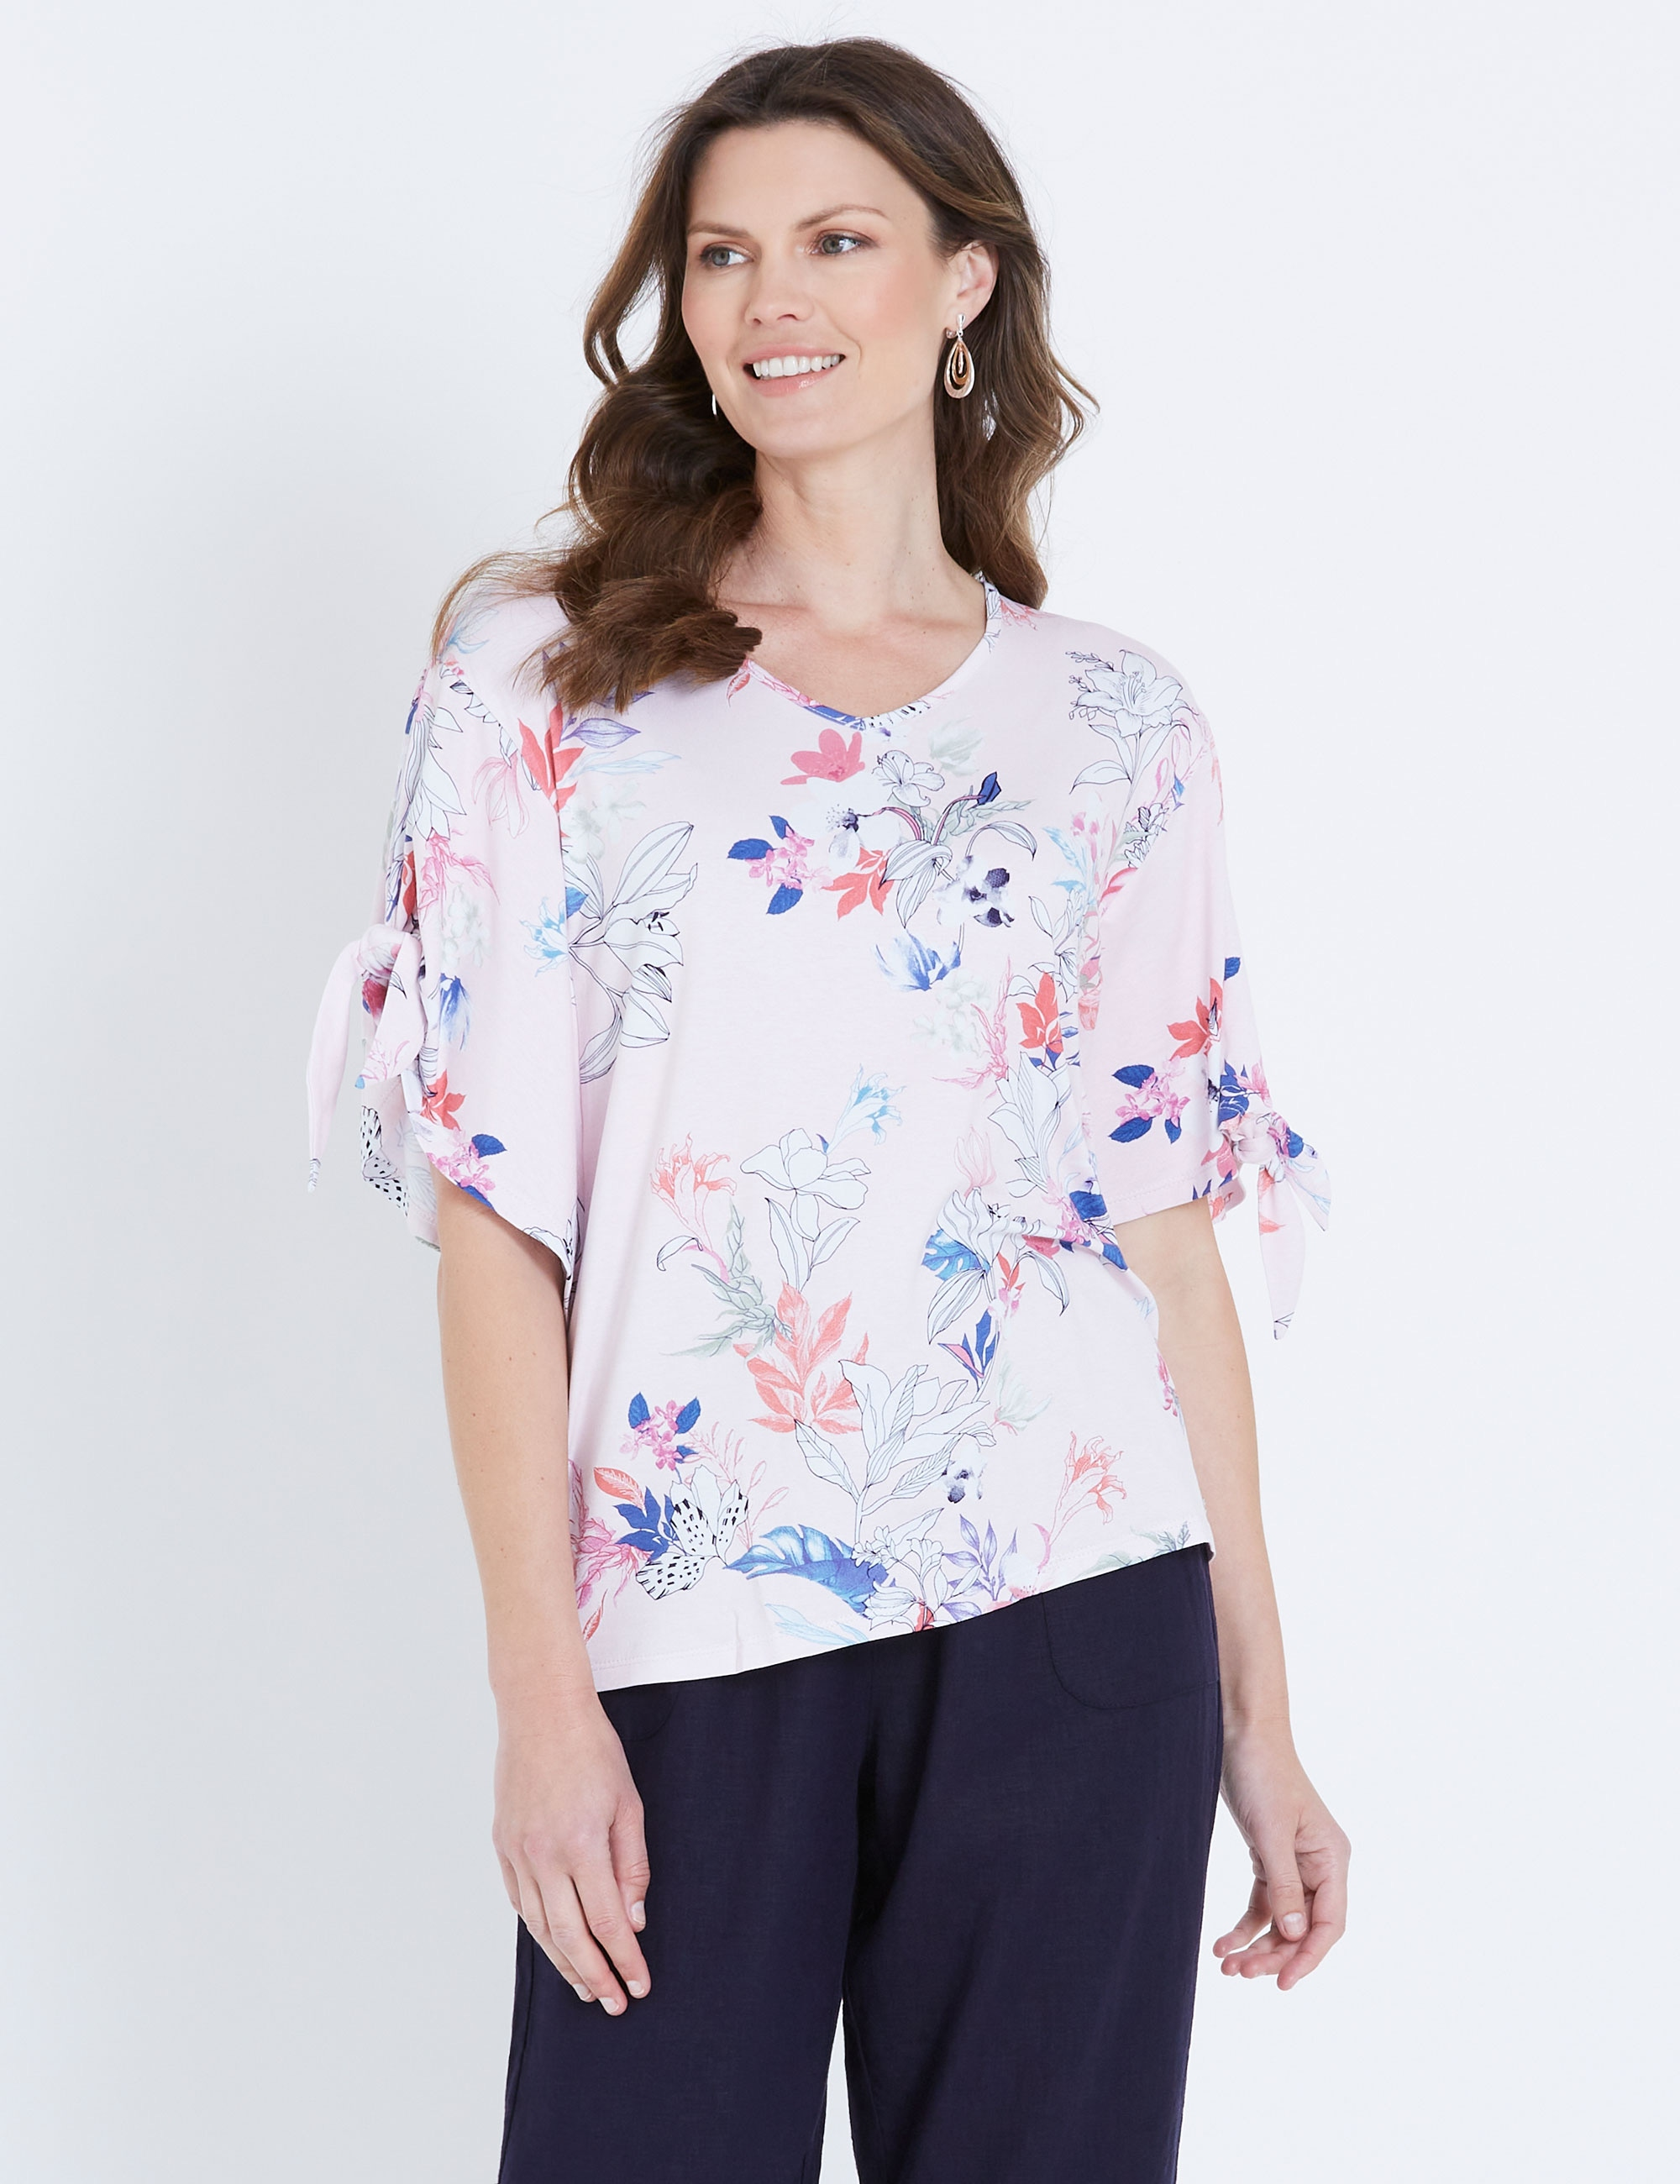 1055536900 1 - Women Fashion